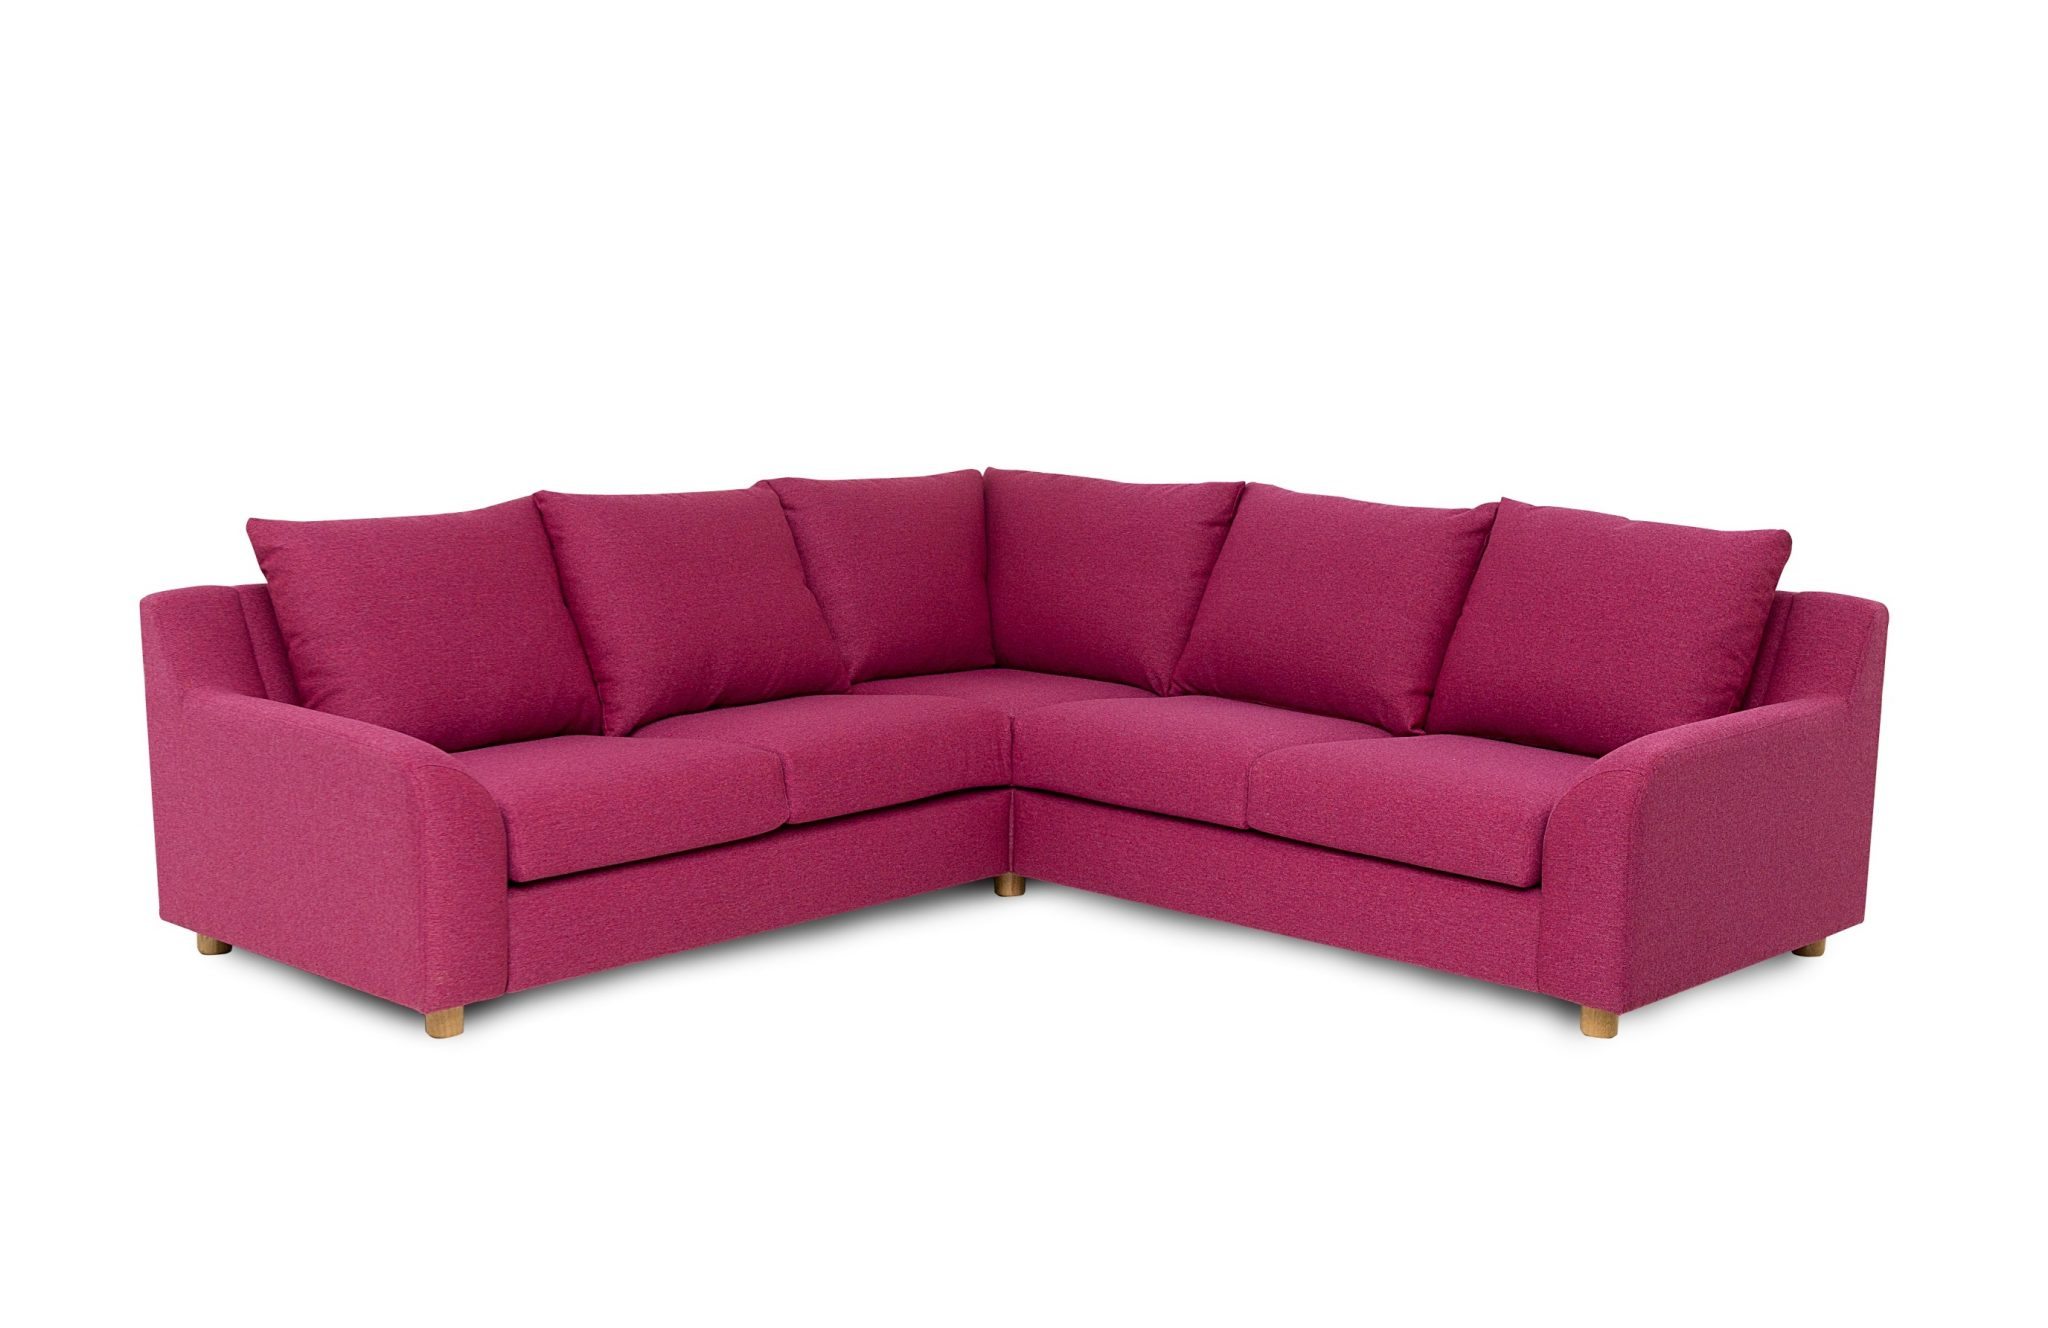 Nordic Living Sofa Scandinavian Style Softnord (10)